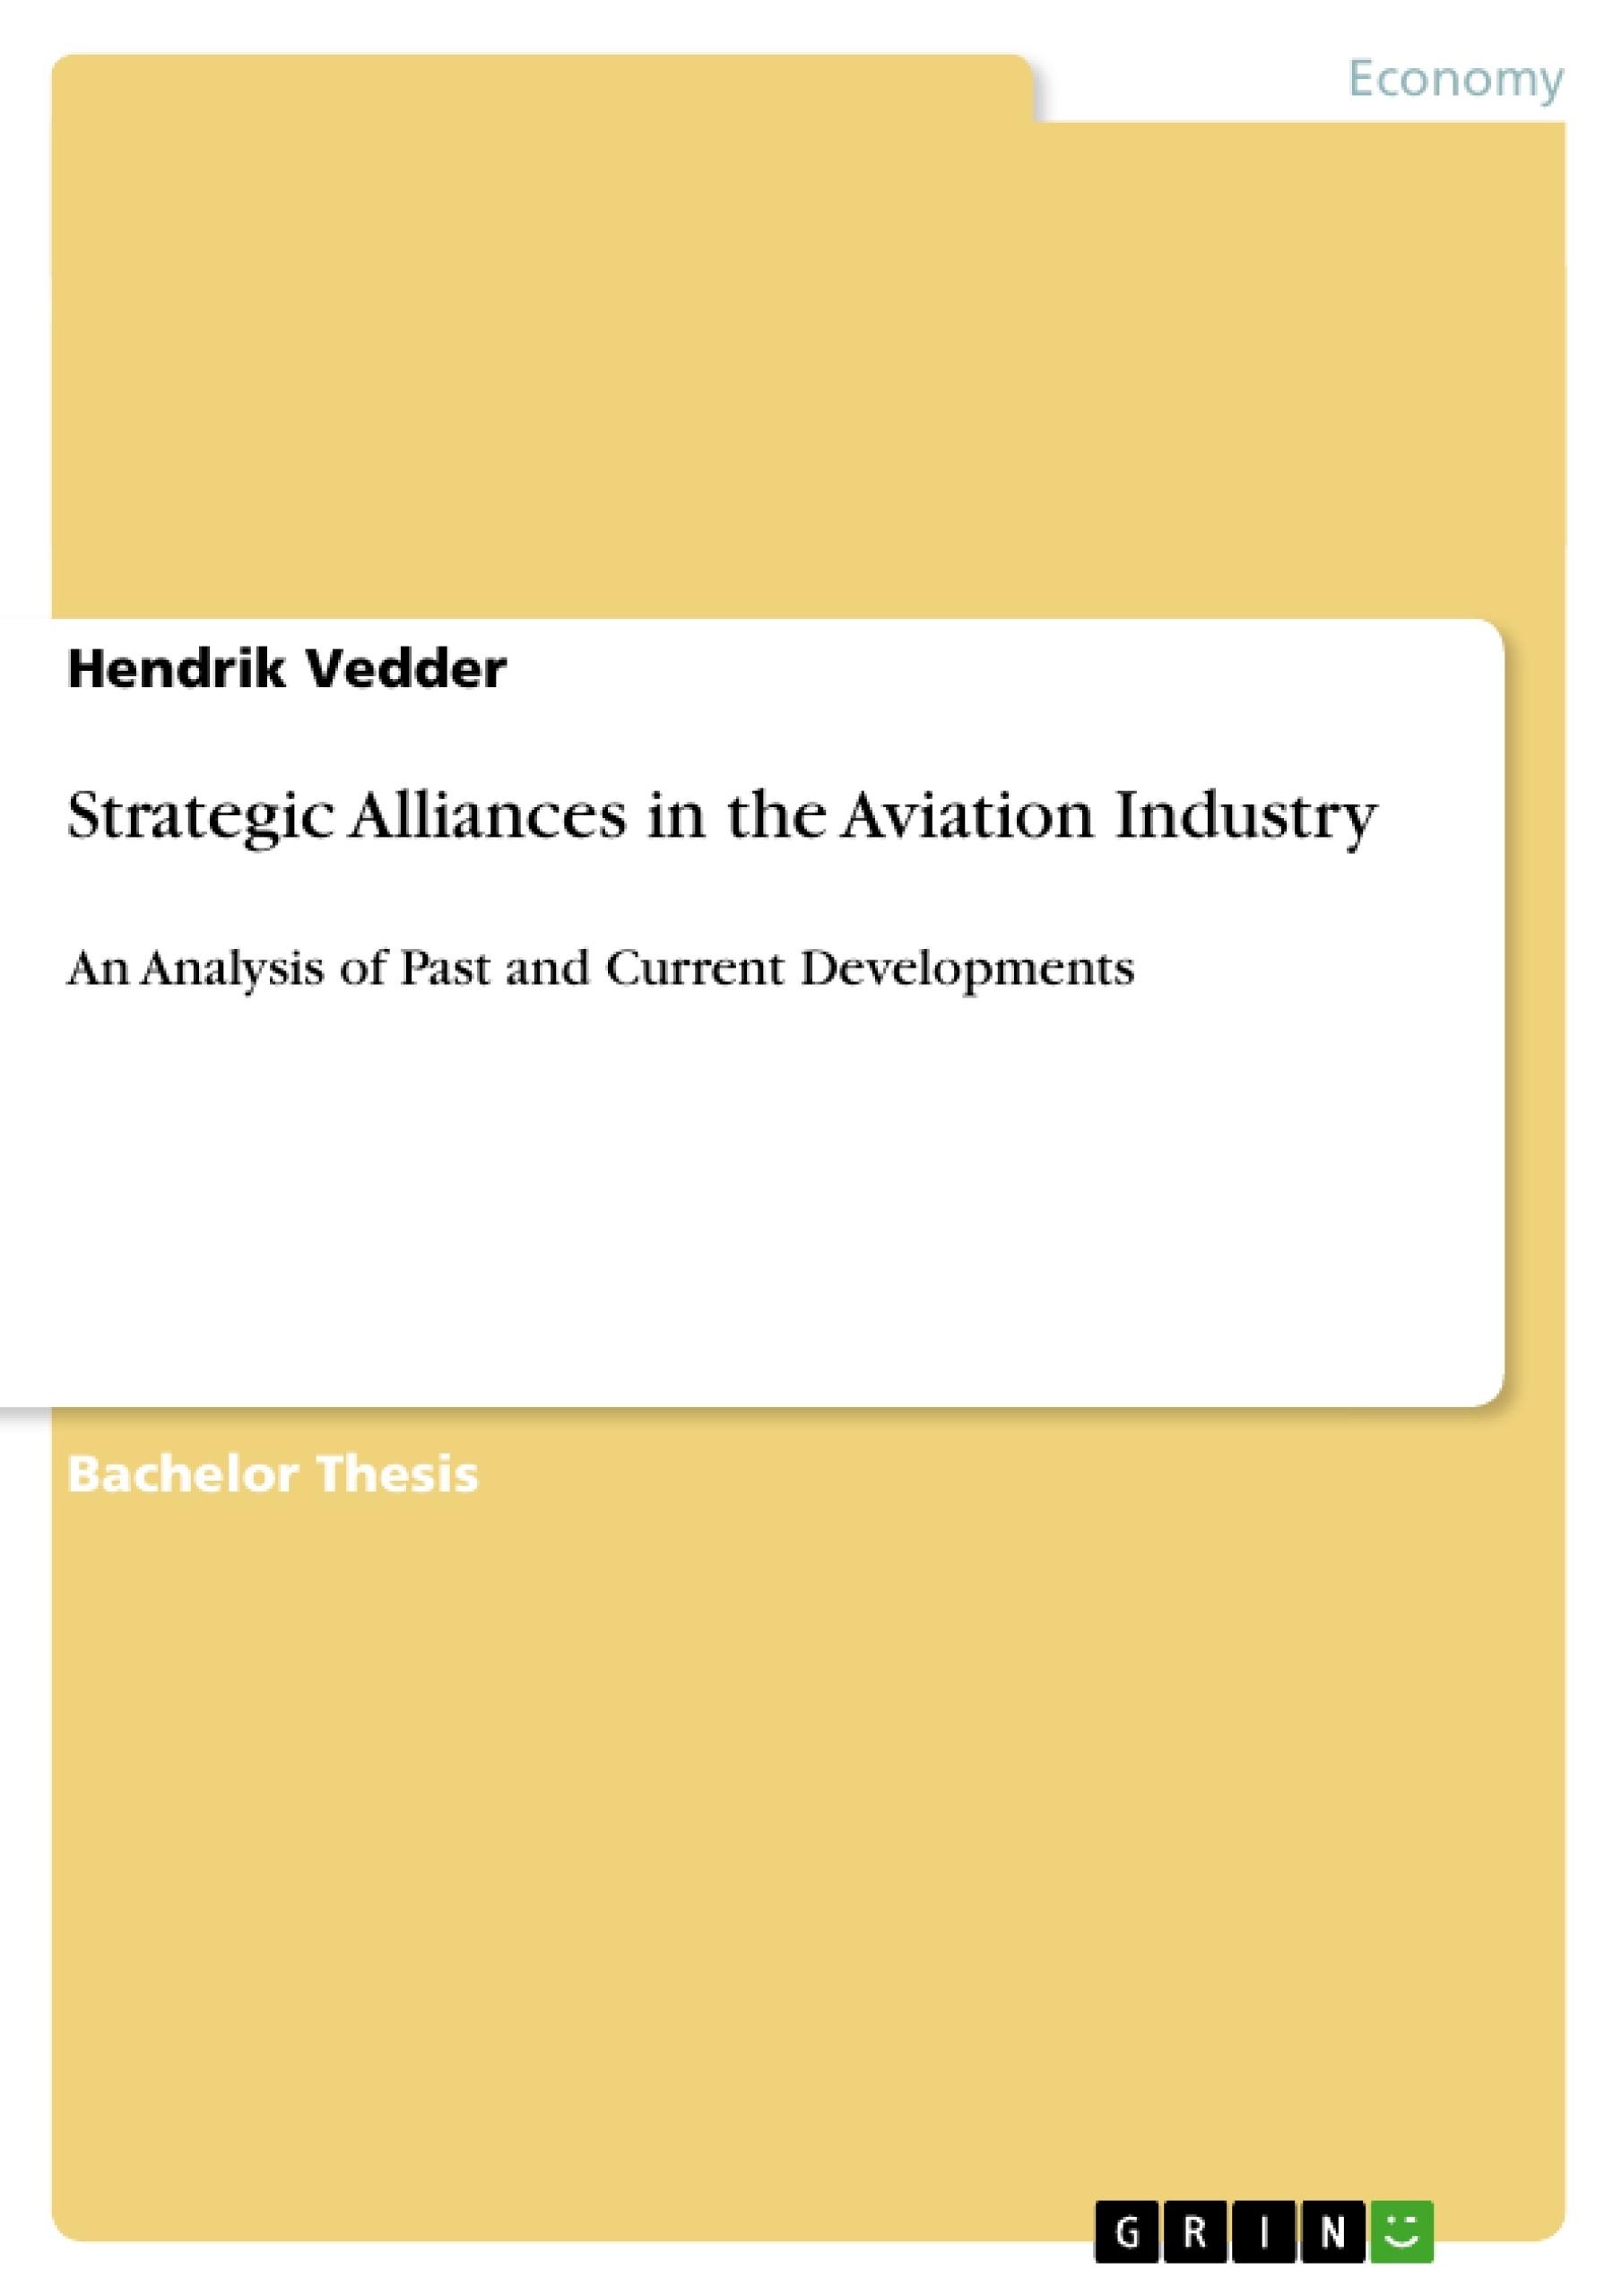 microeconomics in aviation industry essay